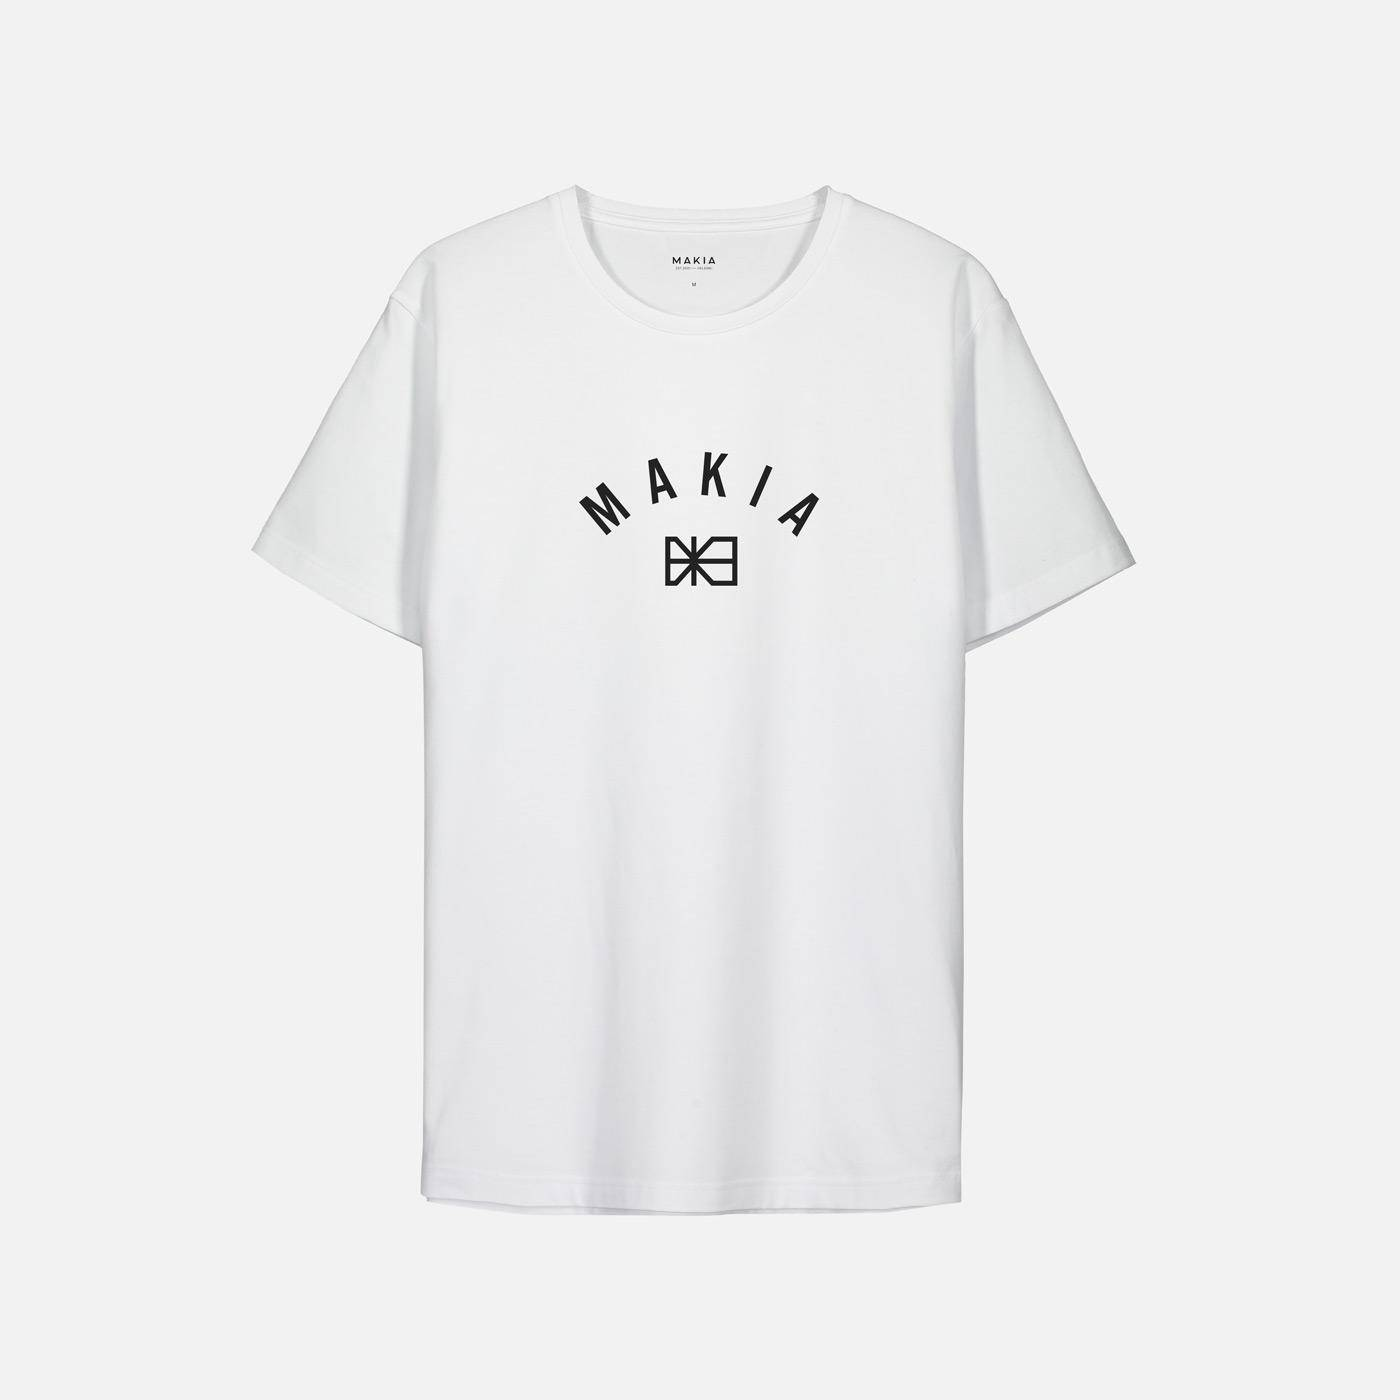 Makia Brand miesten t-paita